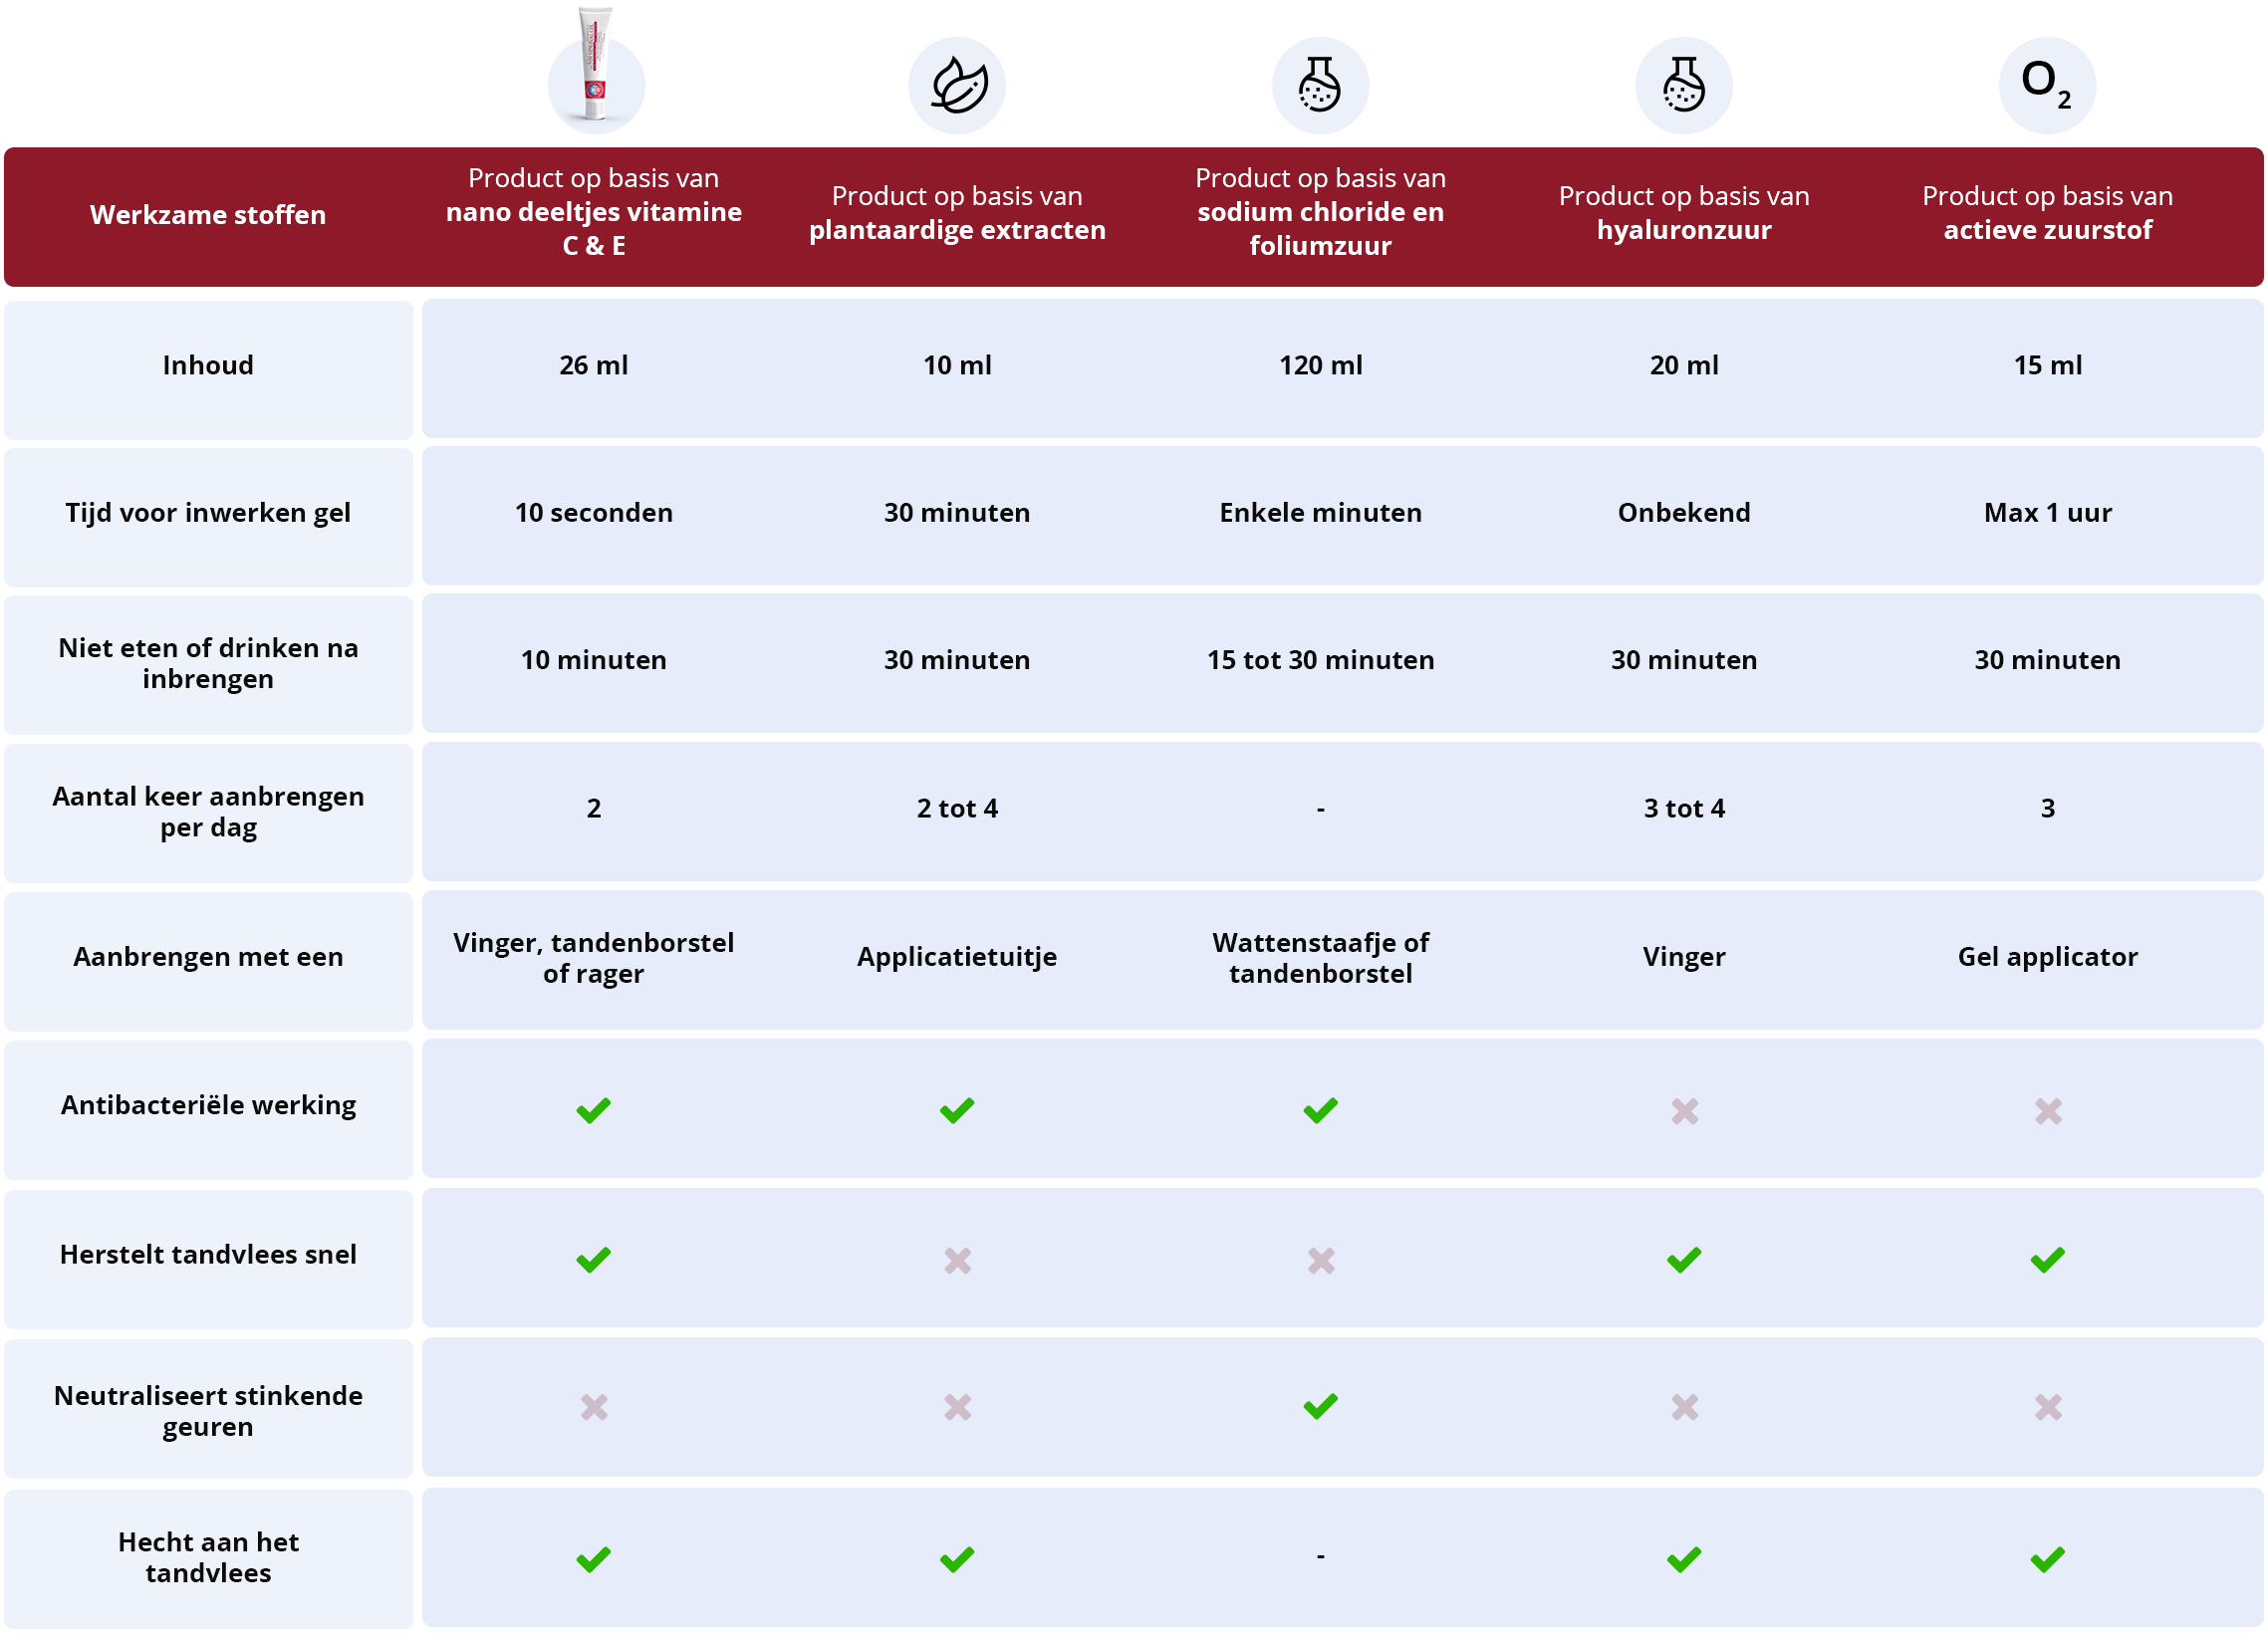 tabel werkzame stoffen